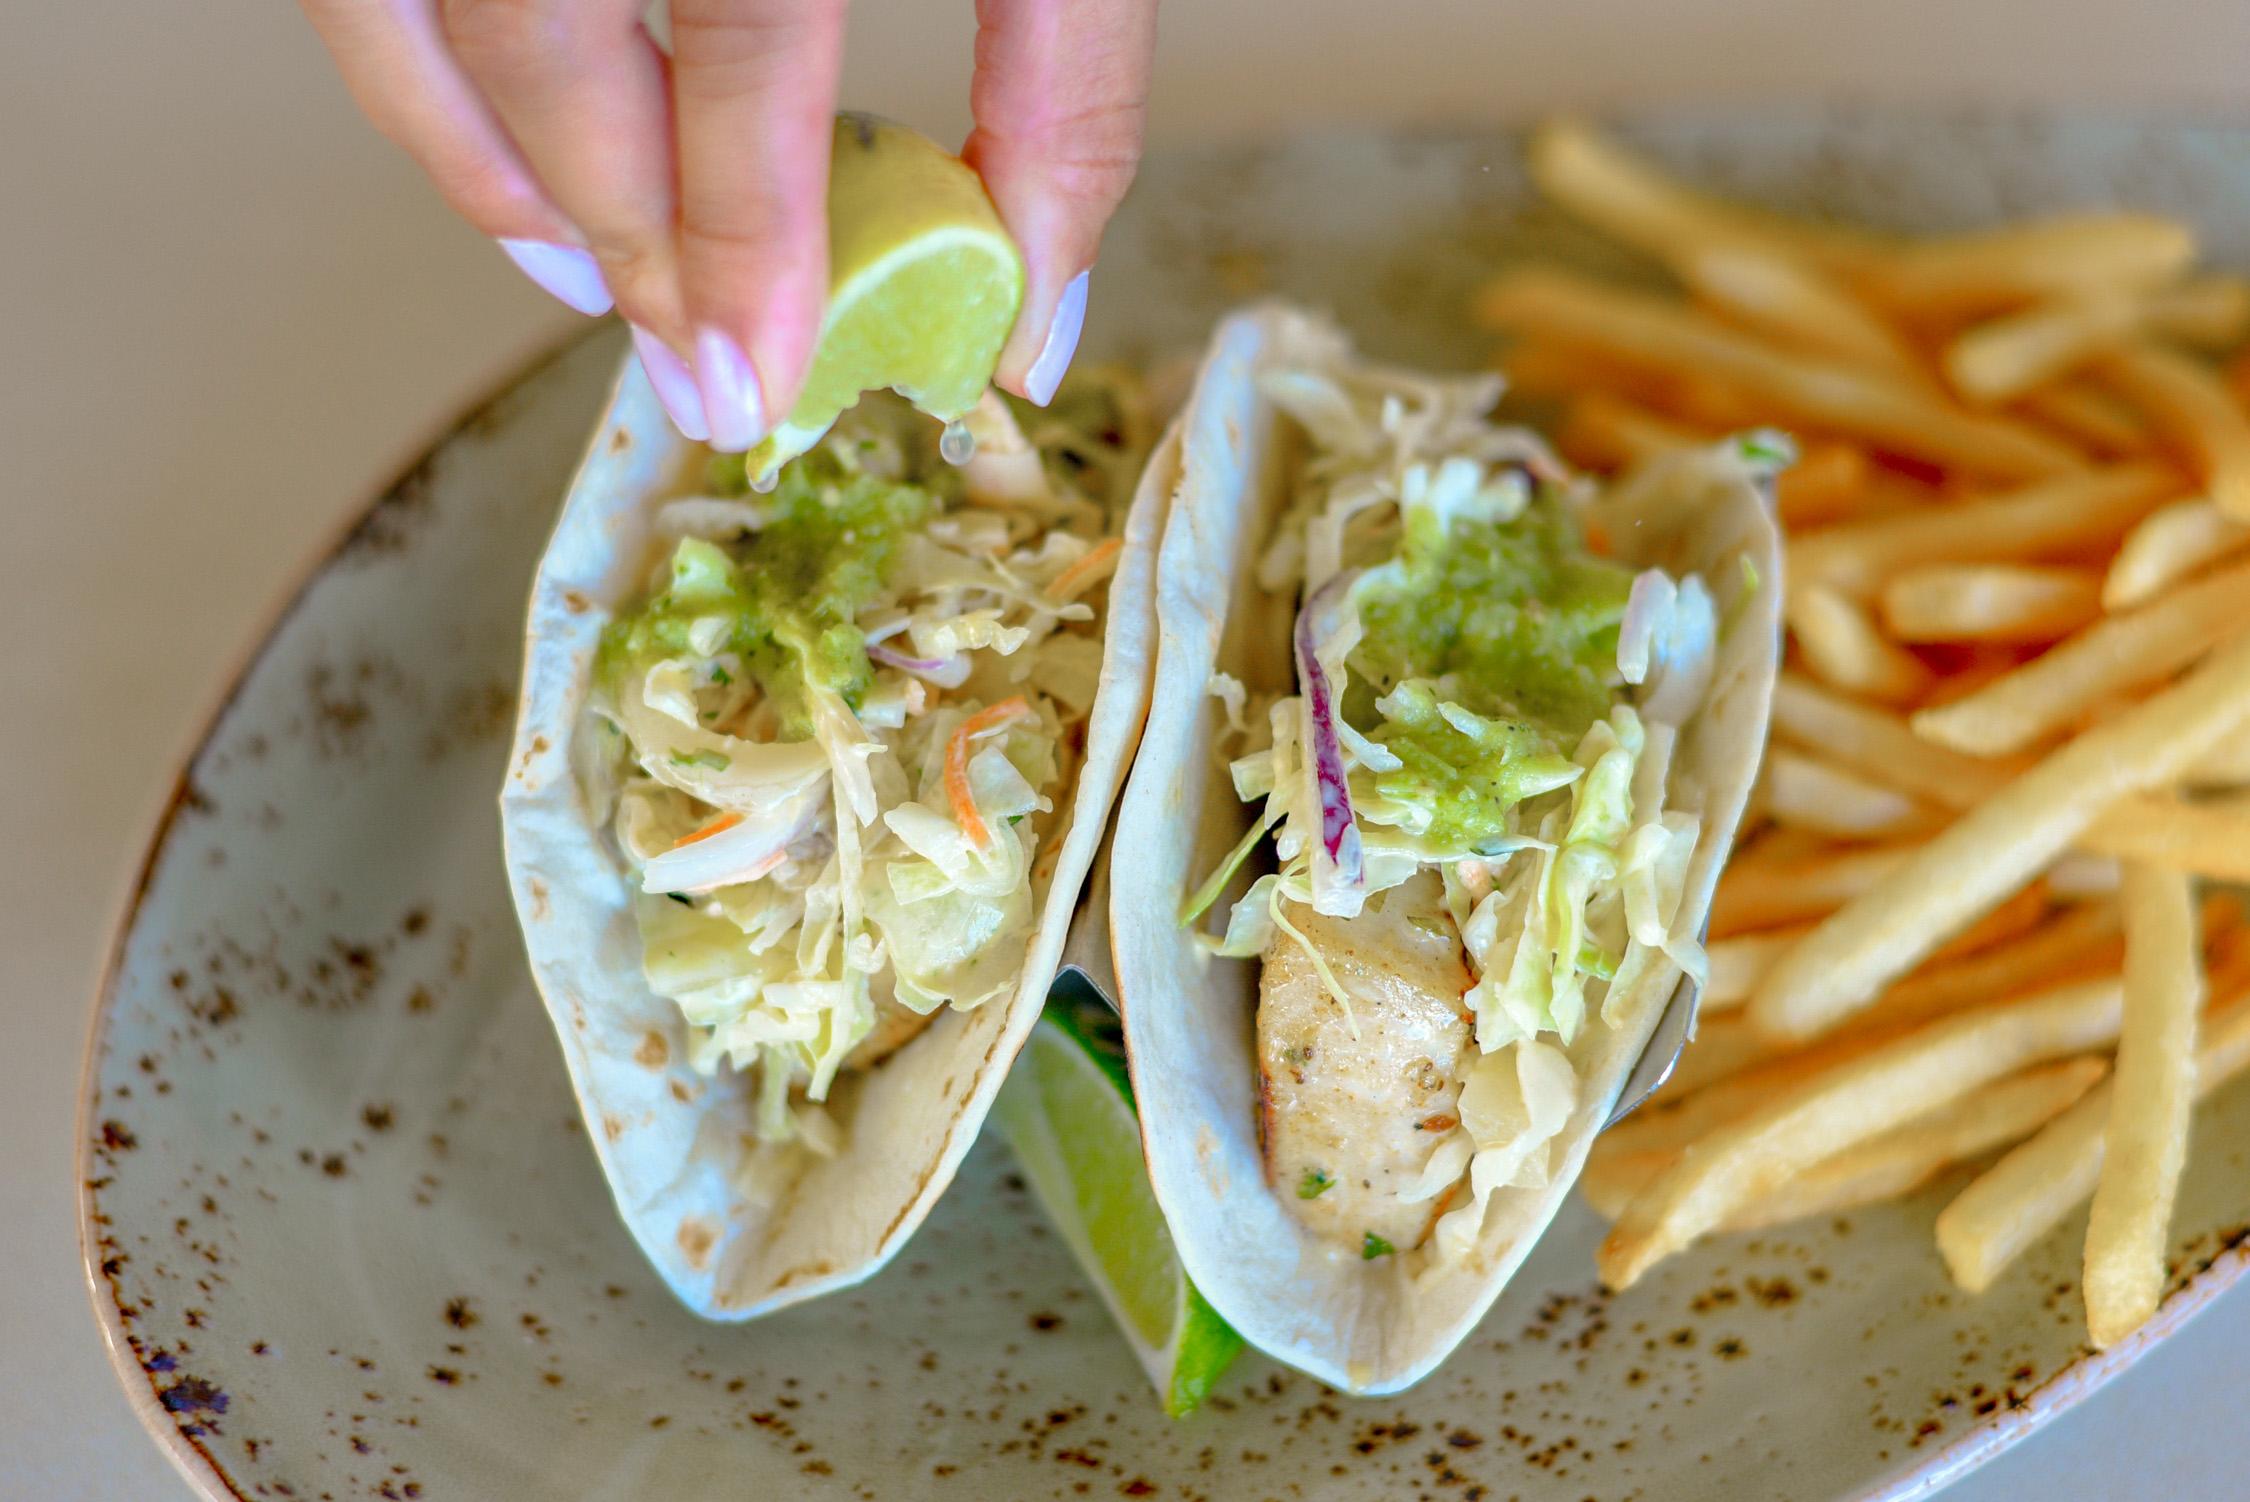 Fish tacos from Ocean Bar & Grill